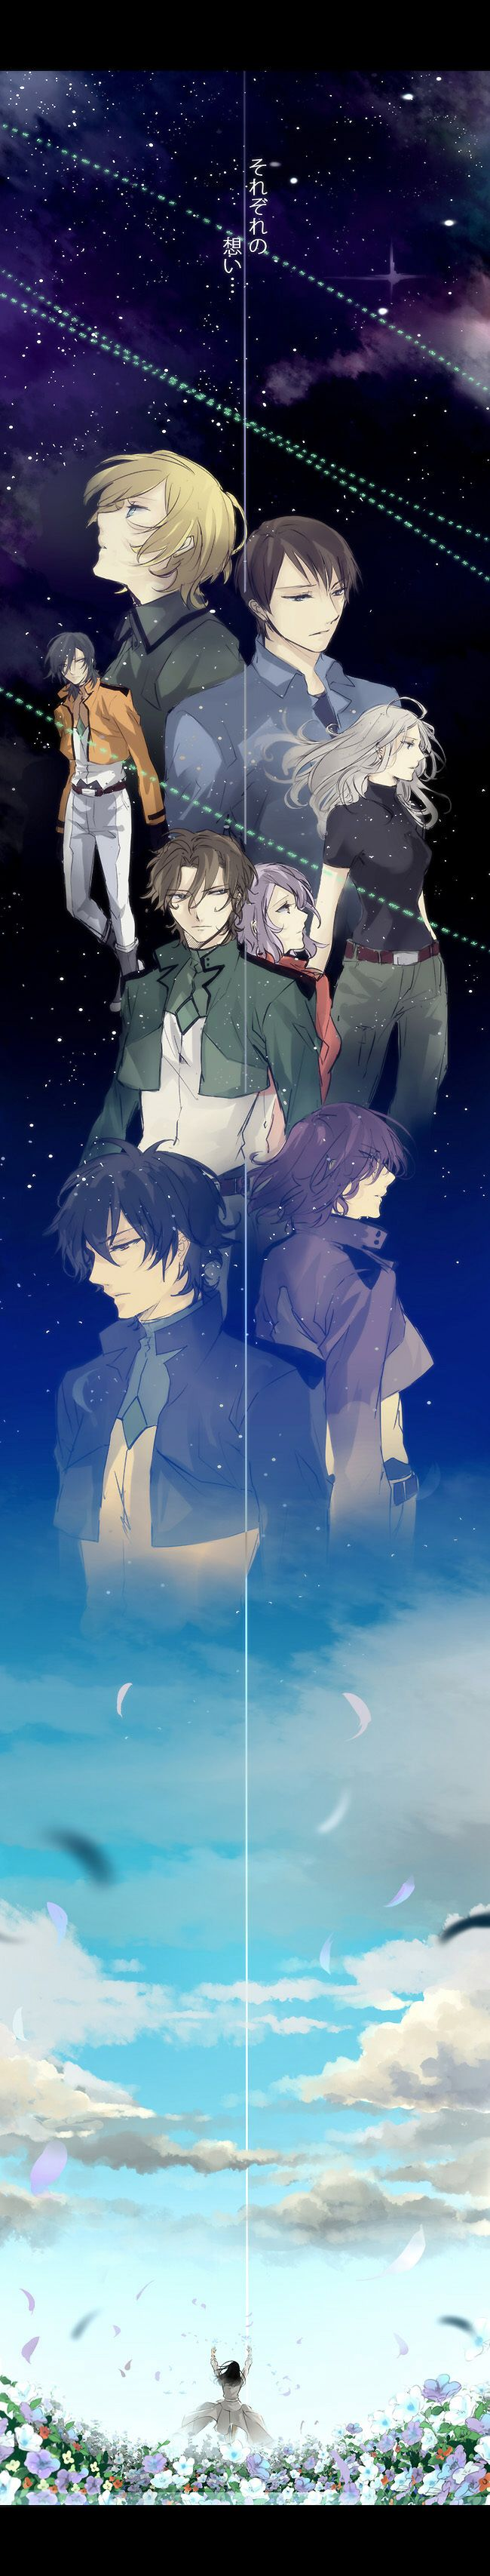 Tags: Anime, Mobile Suit Gundam 00, Louise Halevy, Saji Crossroad, Setsuna F. Seiei